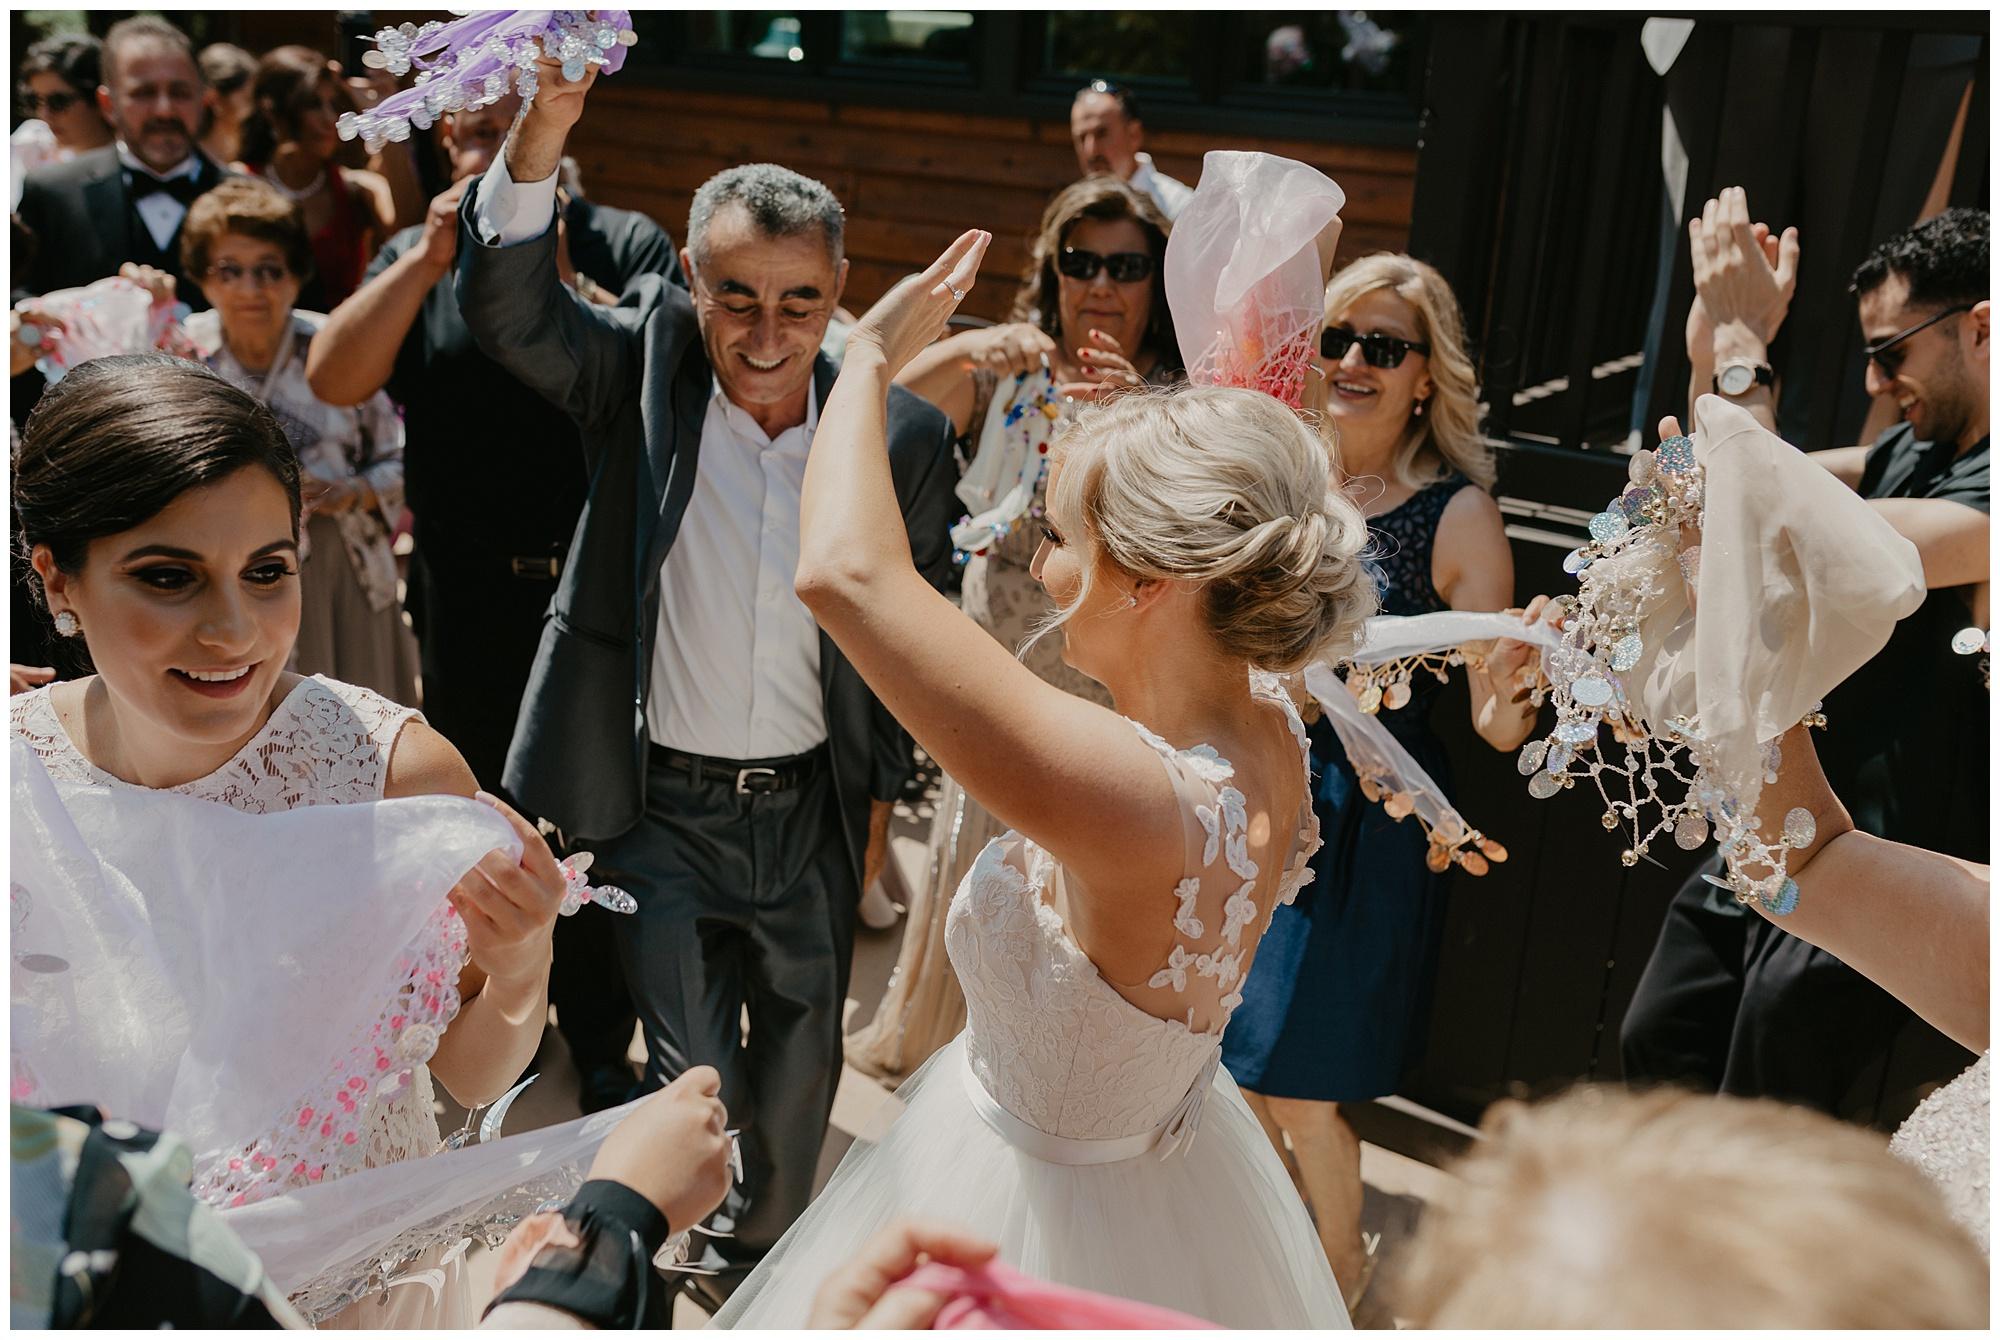 pear_tree_estate_wedding_champaign_il_wright_photographs_jj_0078.jpg